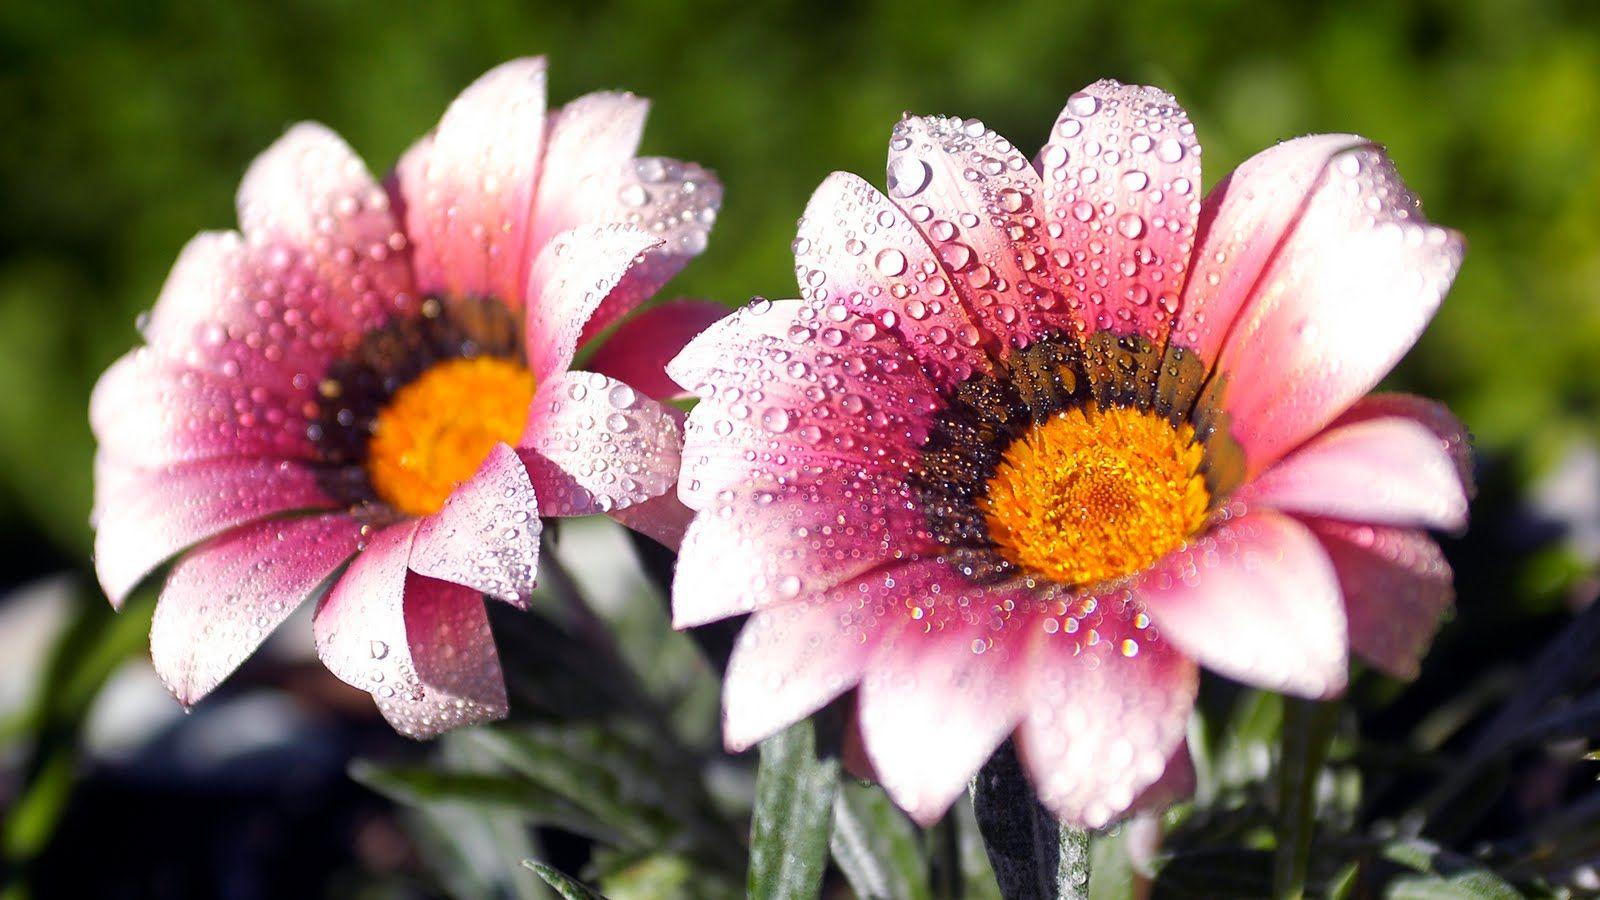 Flower wallpaper free download wallpapers qaqaa pinterest flower wallpaper free download wallpapers izmirmasajfo Images